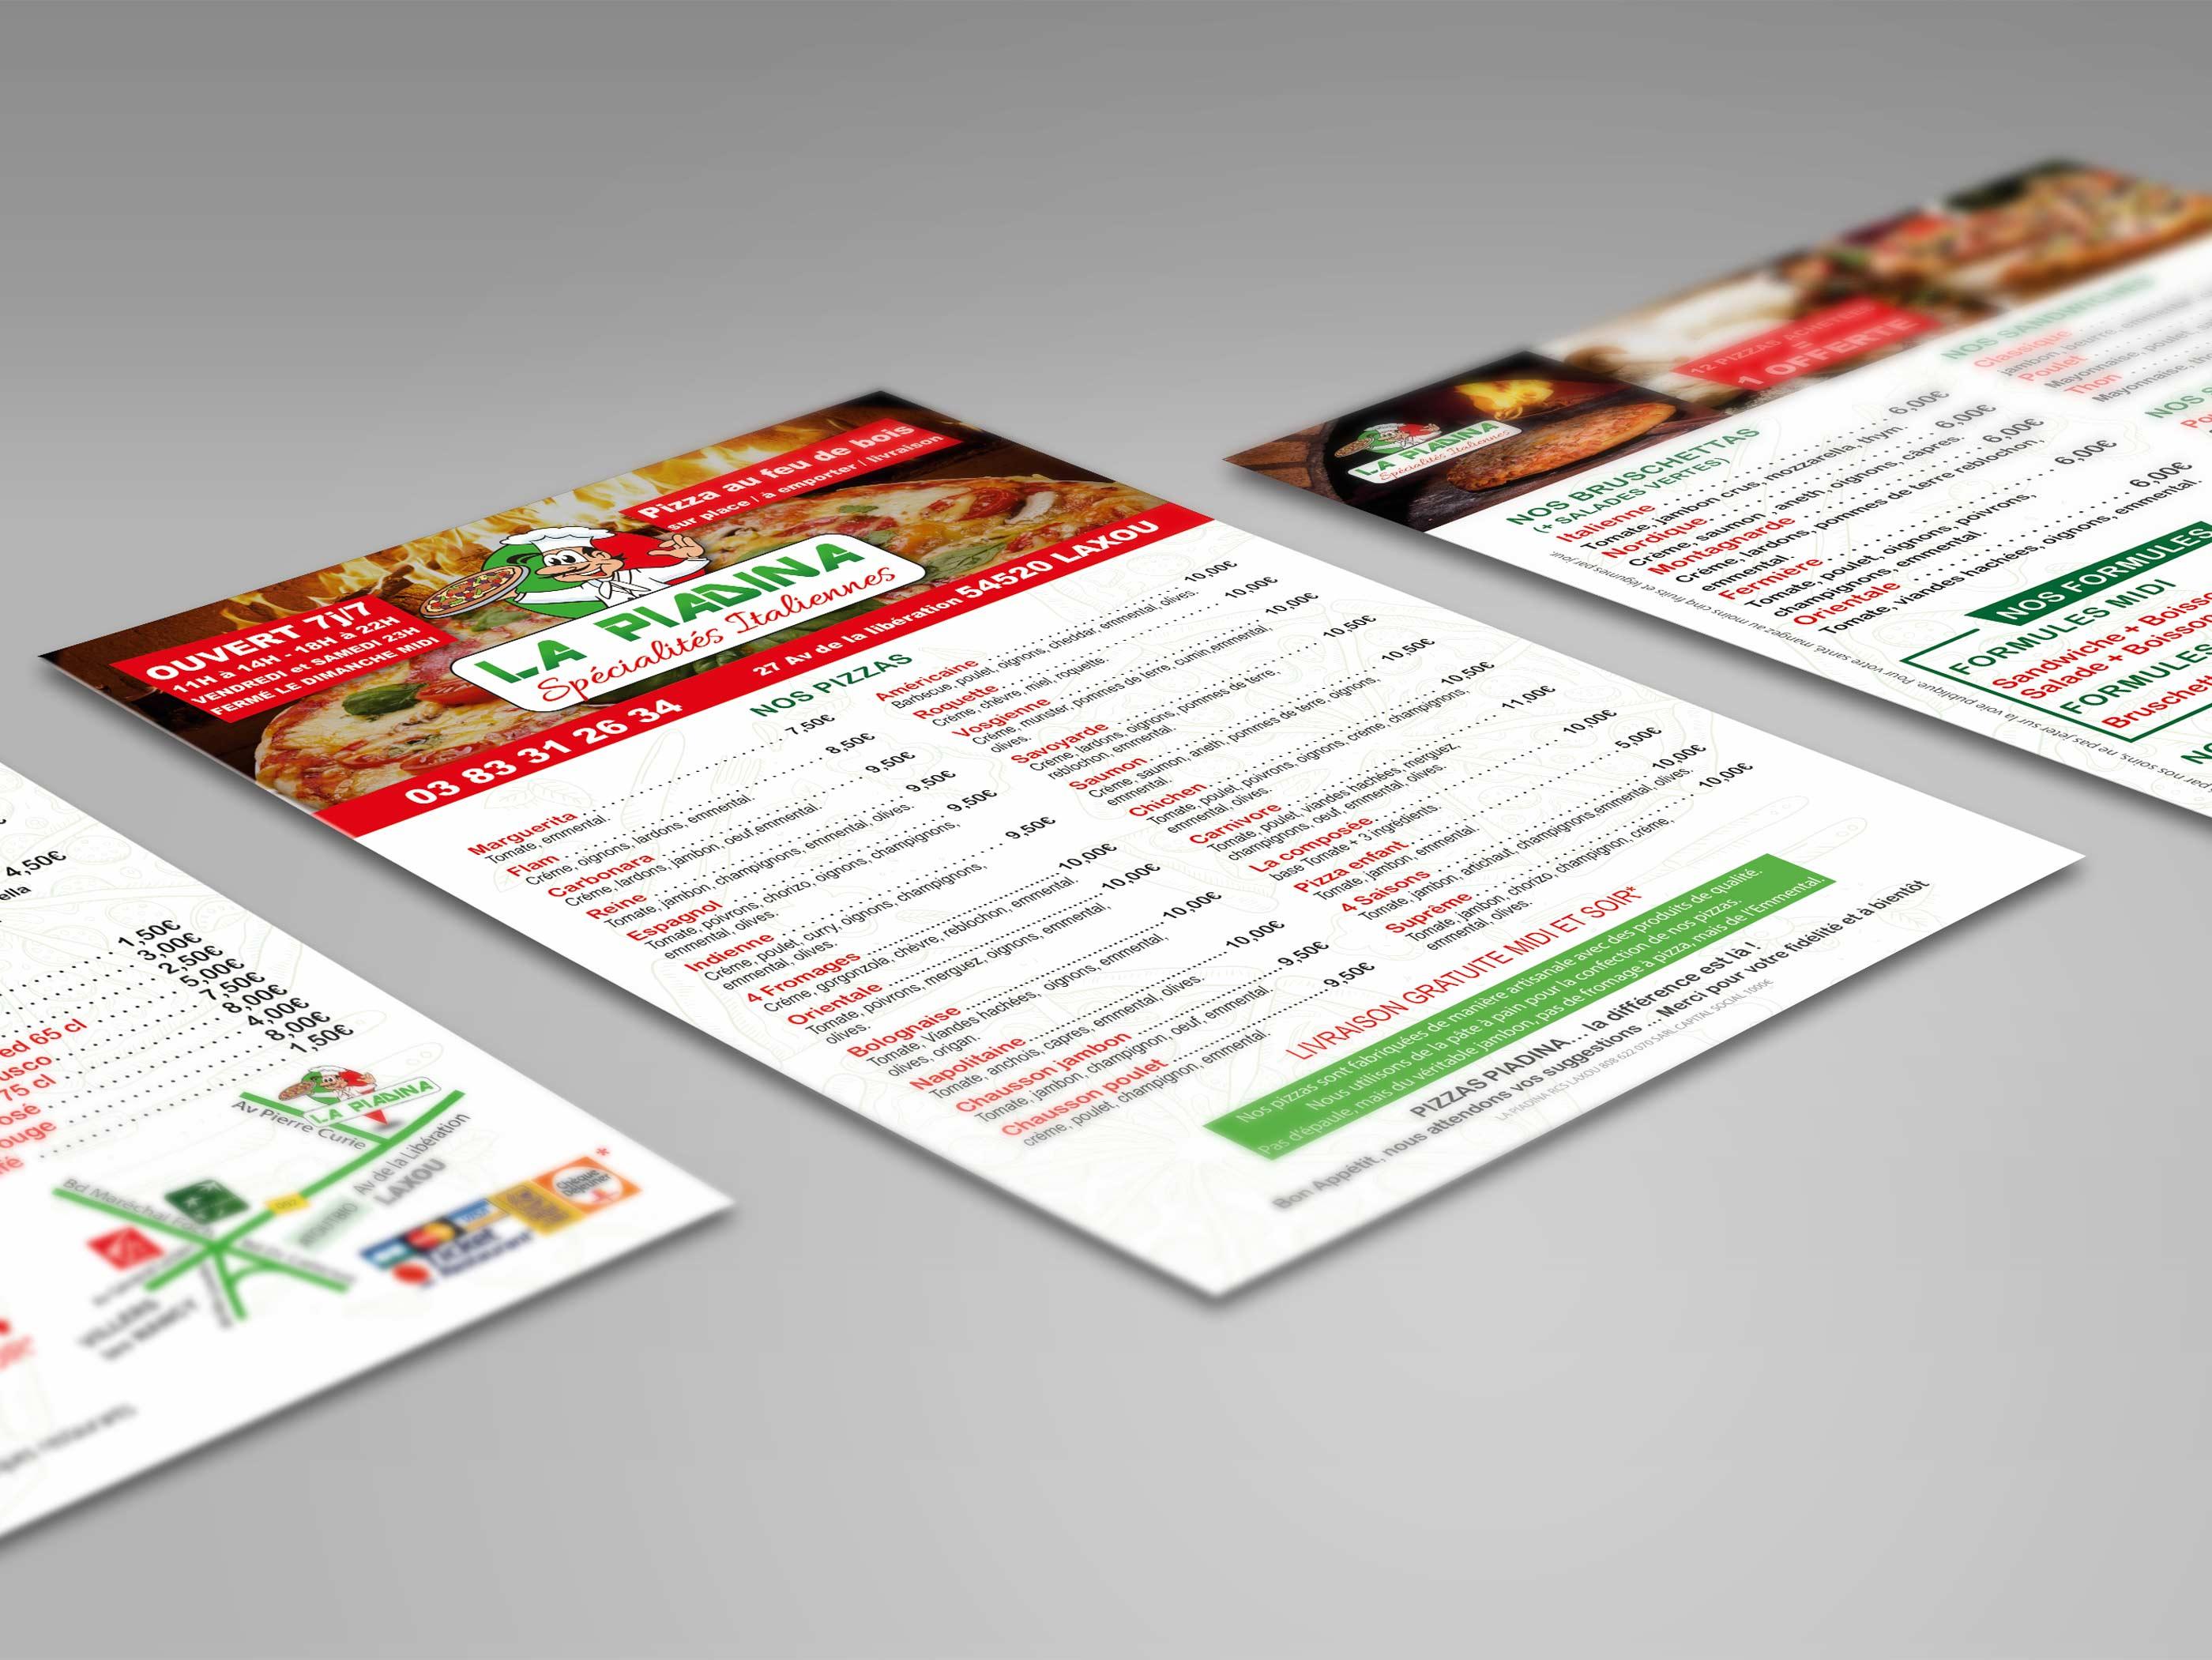 image flyer recto vesto pizzeria la Piadina par ismacom